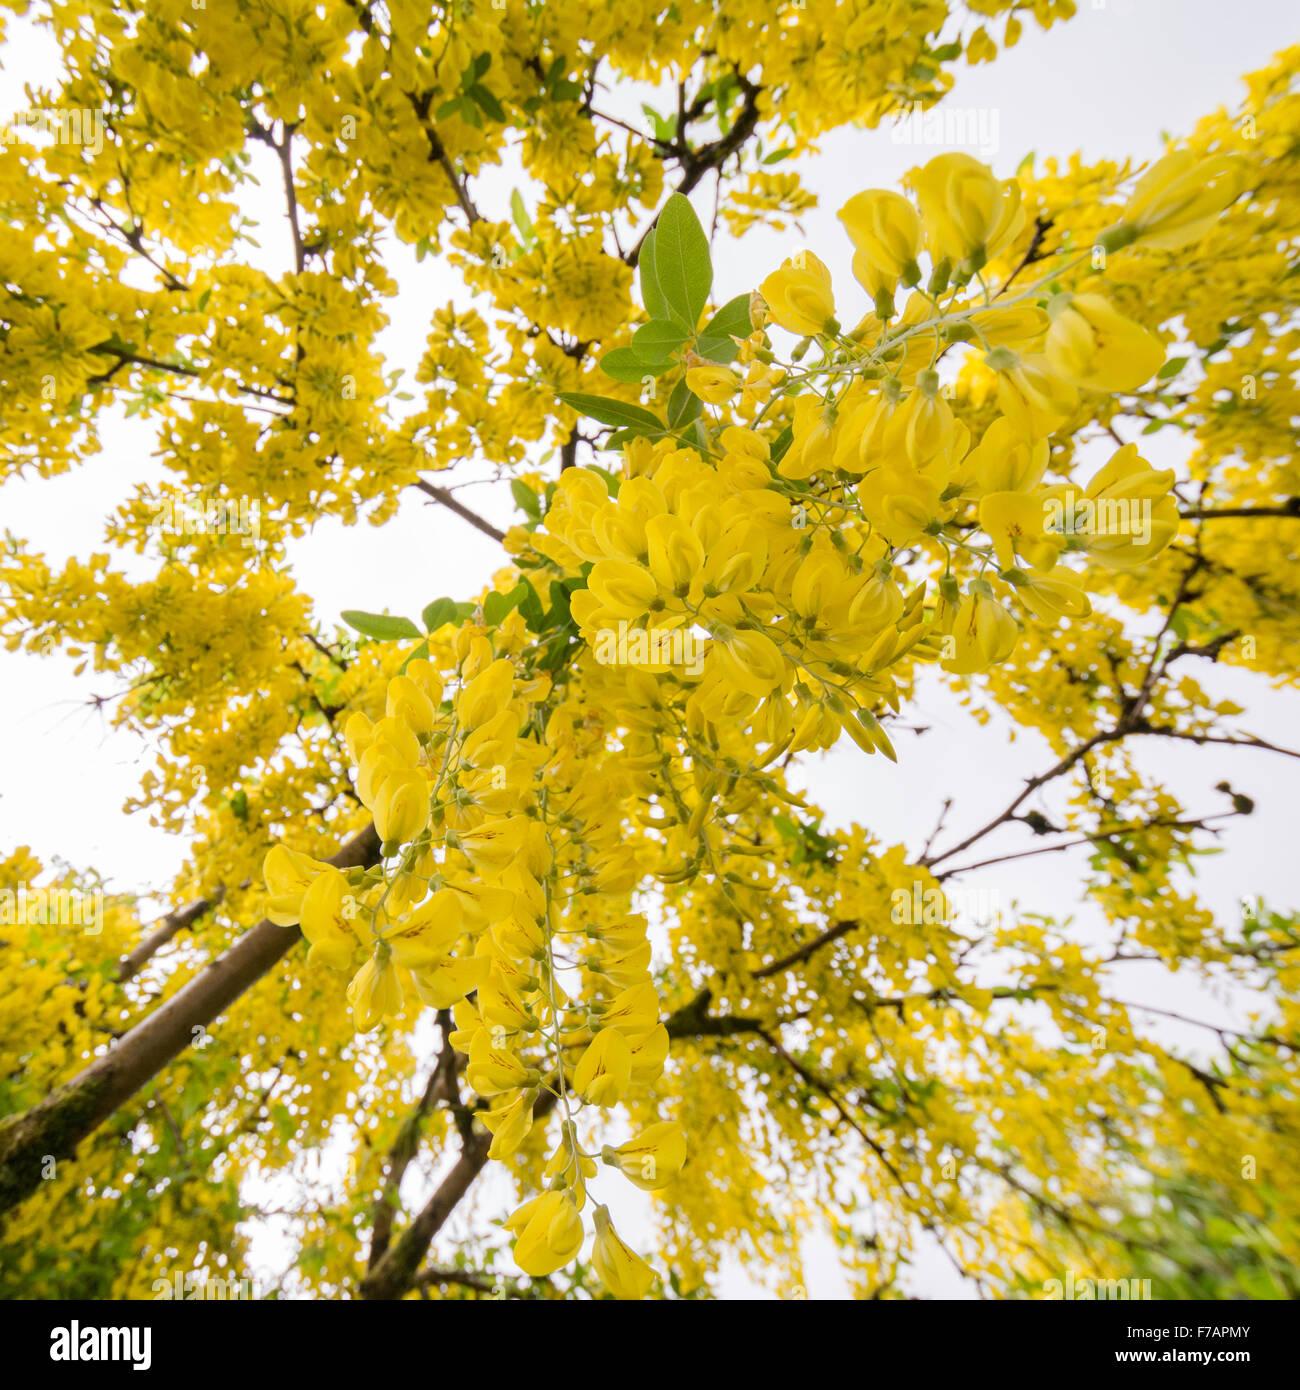 Laburnum tree stock photos laburnum tree stock images alamy common laburnum tree in uk garden standing underneath looking up into the bright yellow flowers mightylinksfo